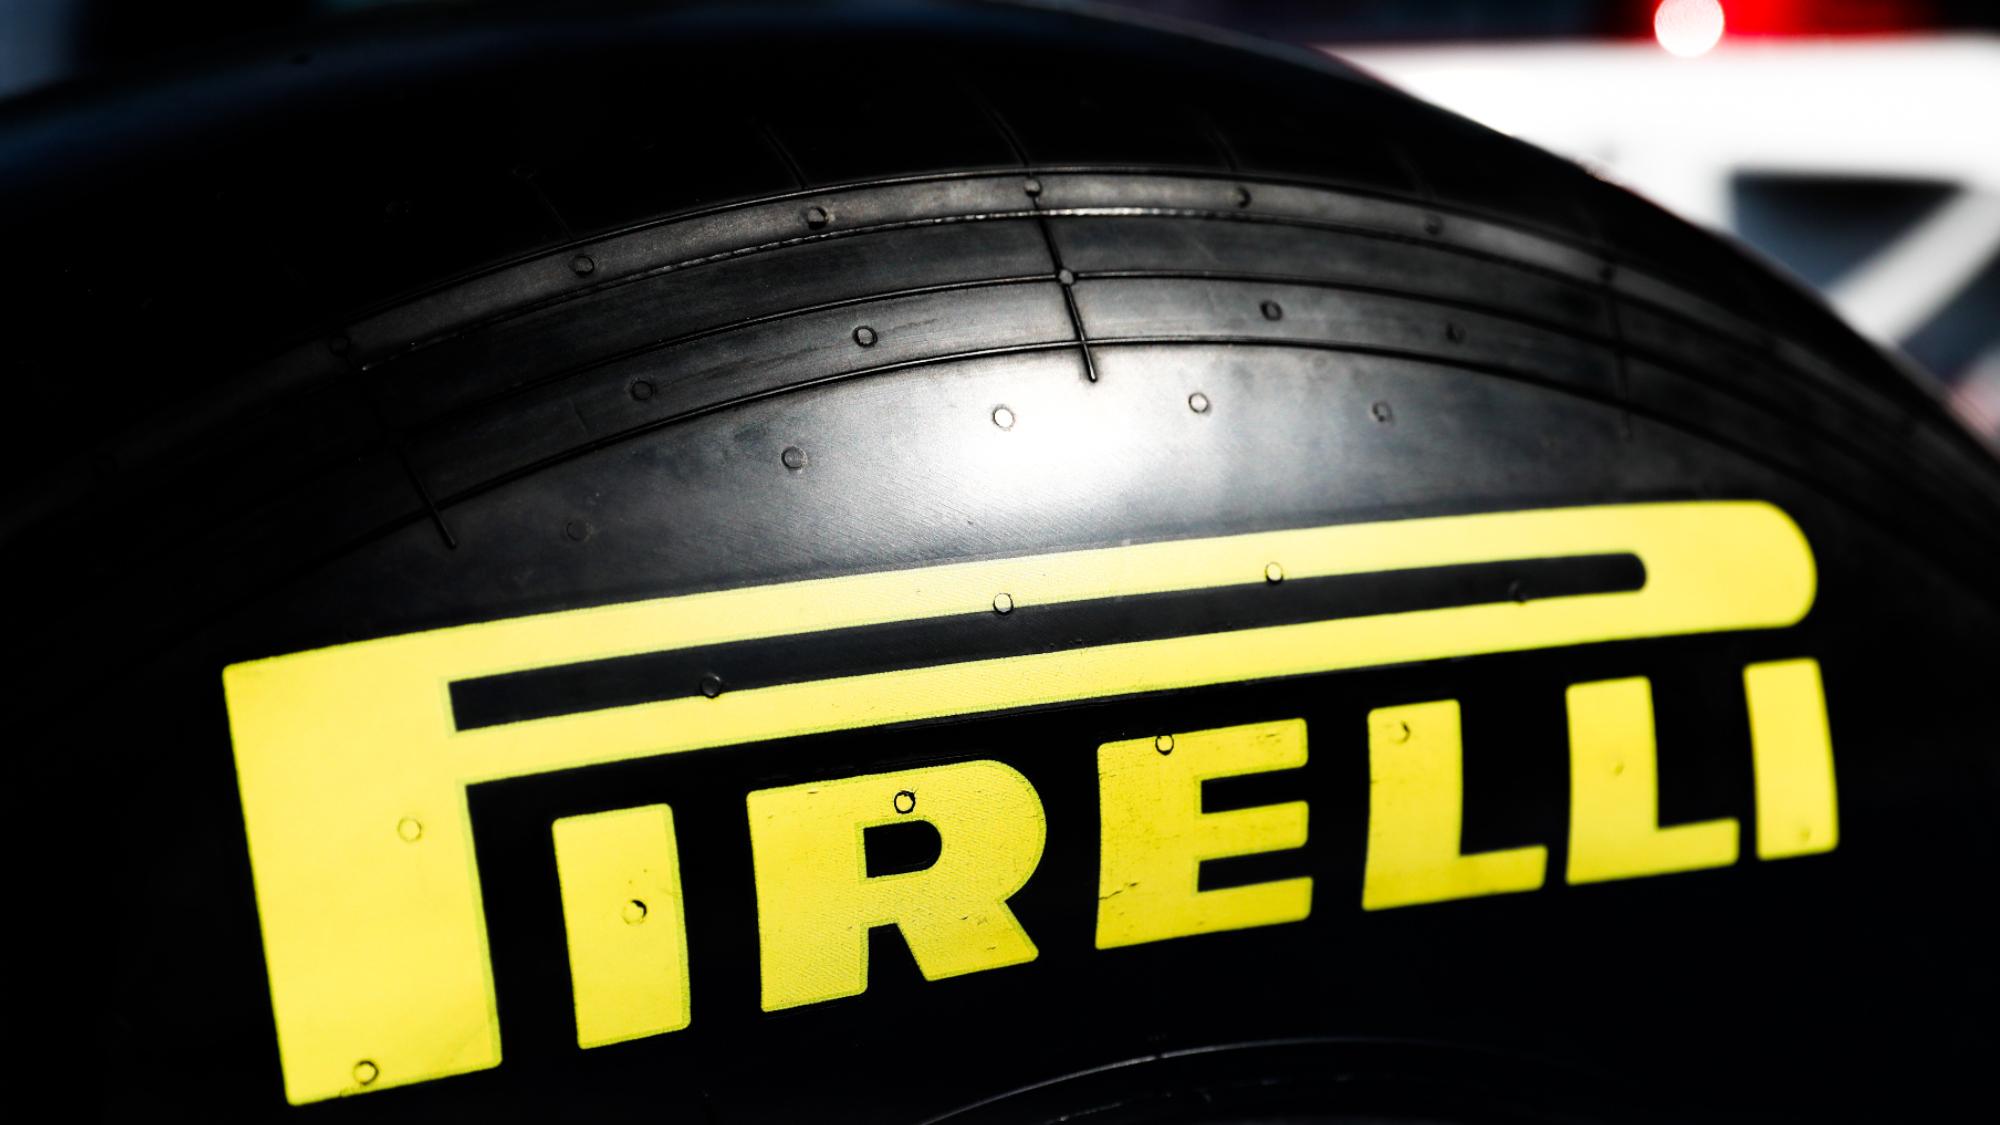 2020 Pirelli F1 tyres